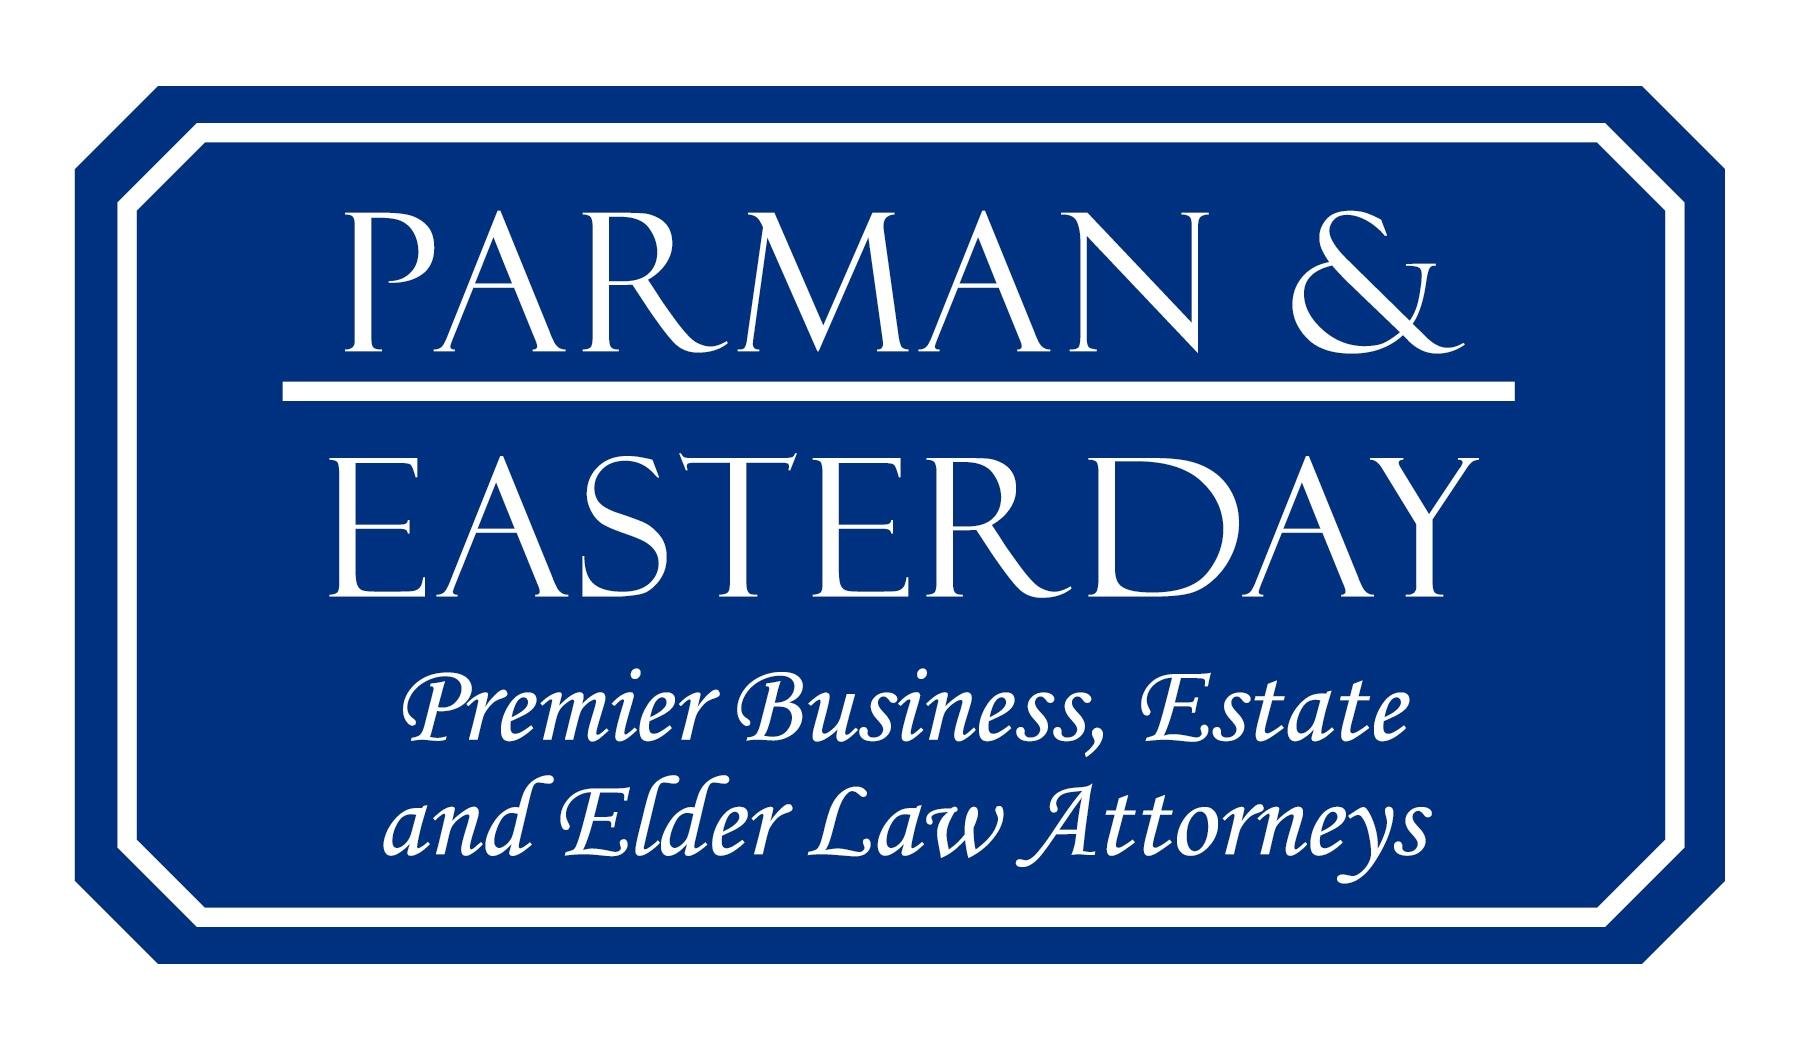 Parman & Easterday